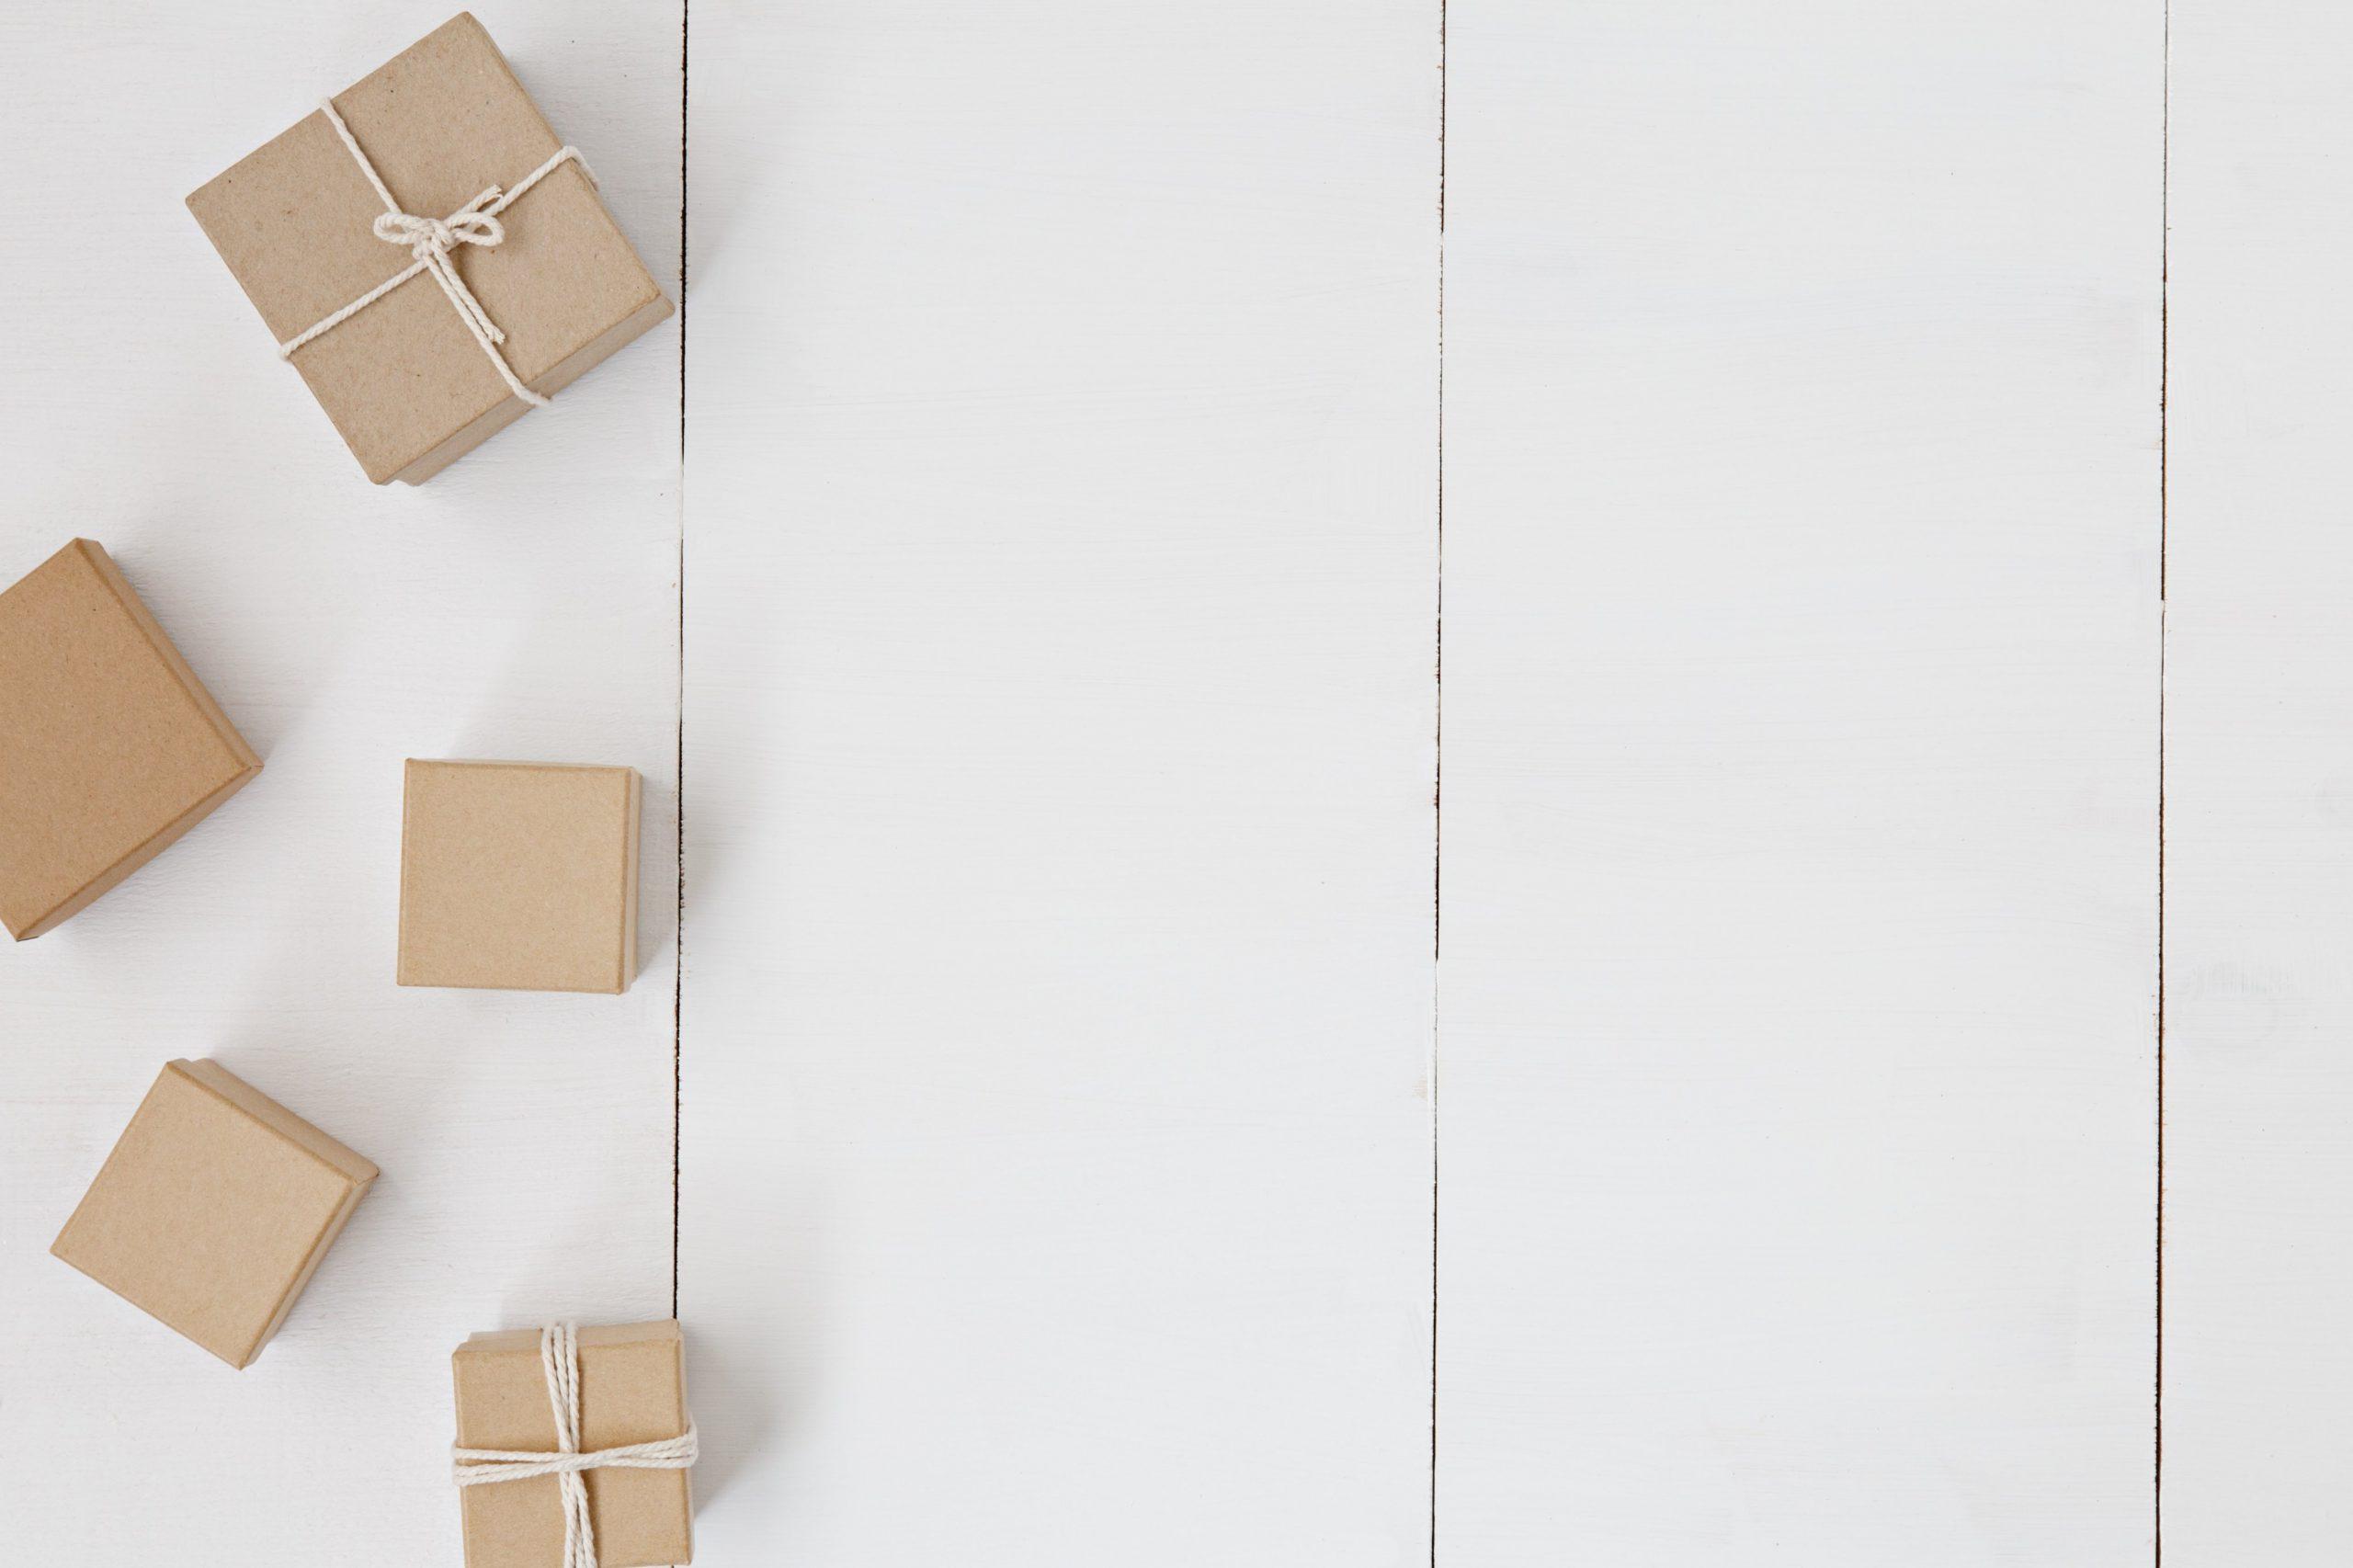 Kartonnen dozen bestellen